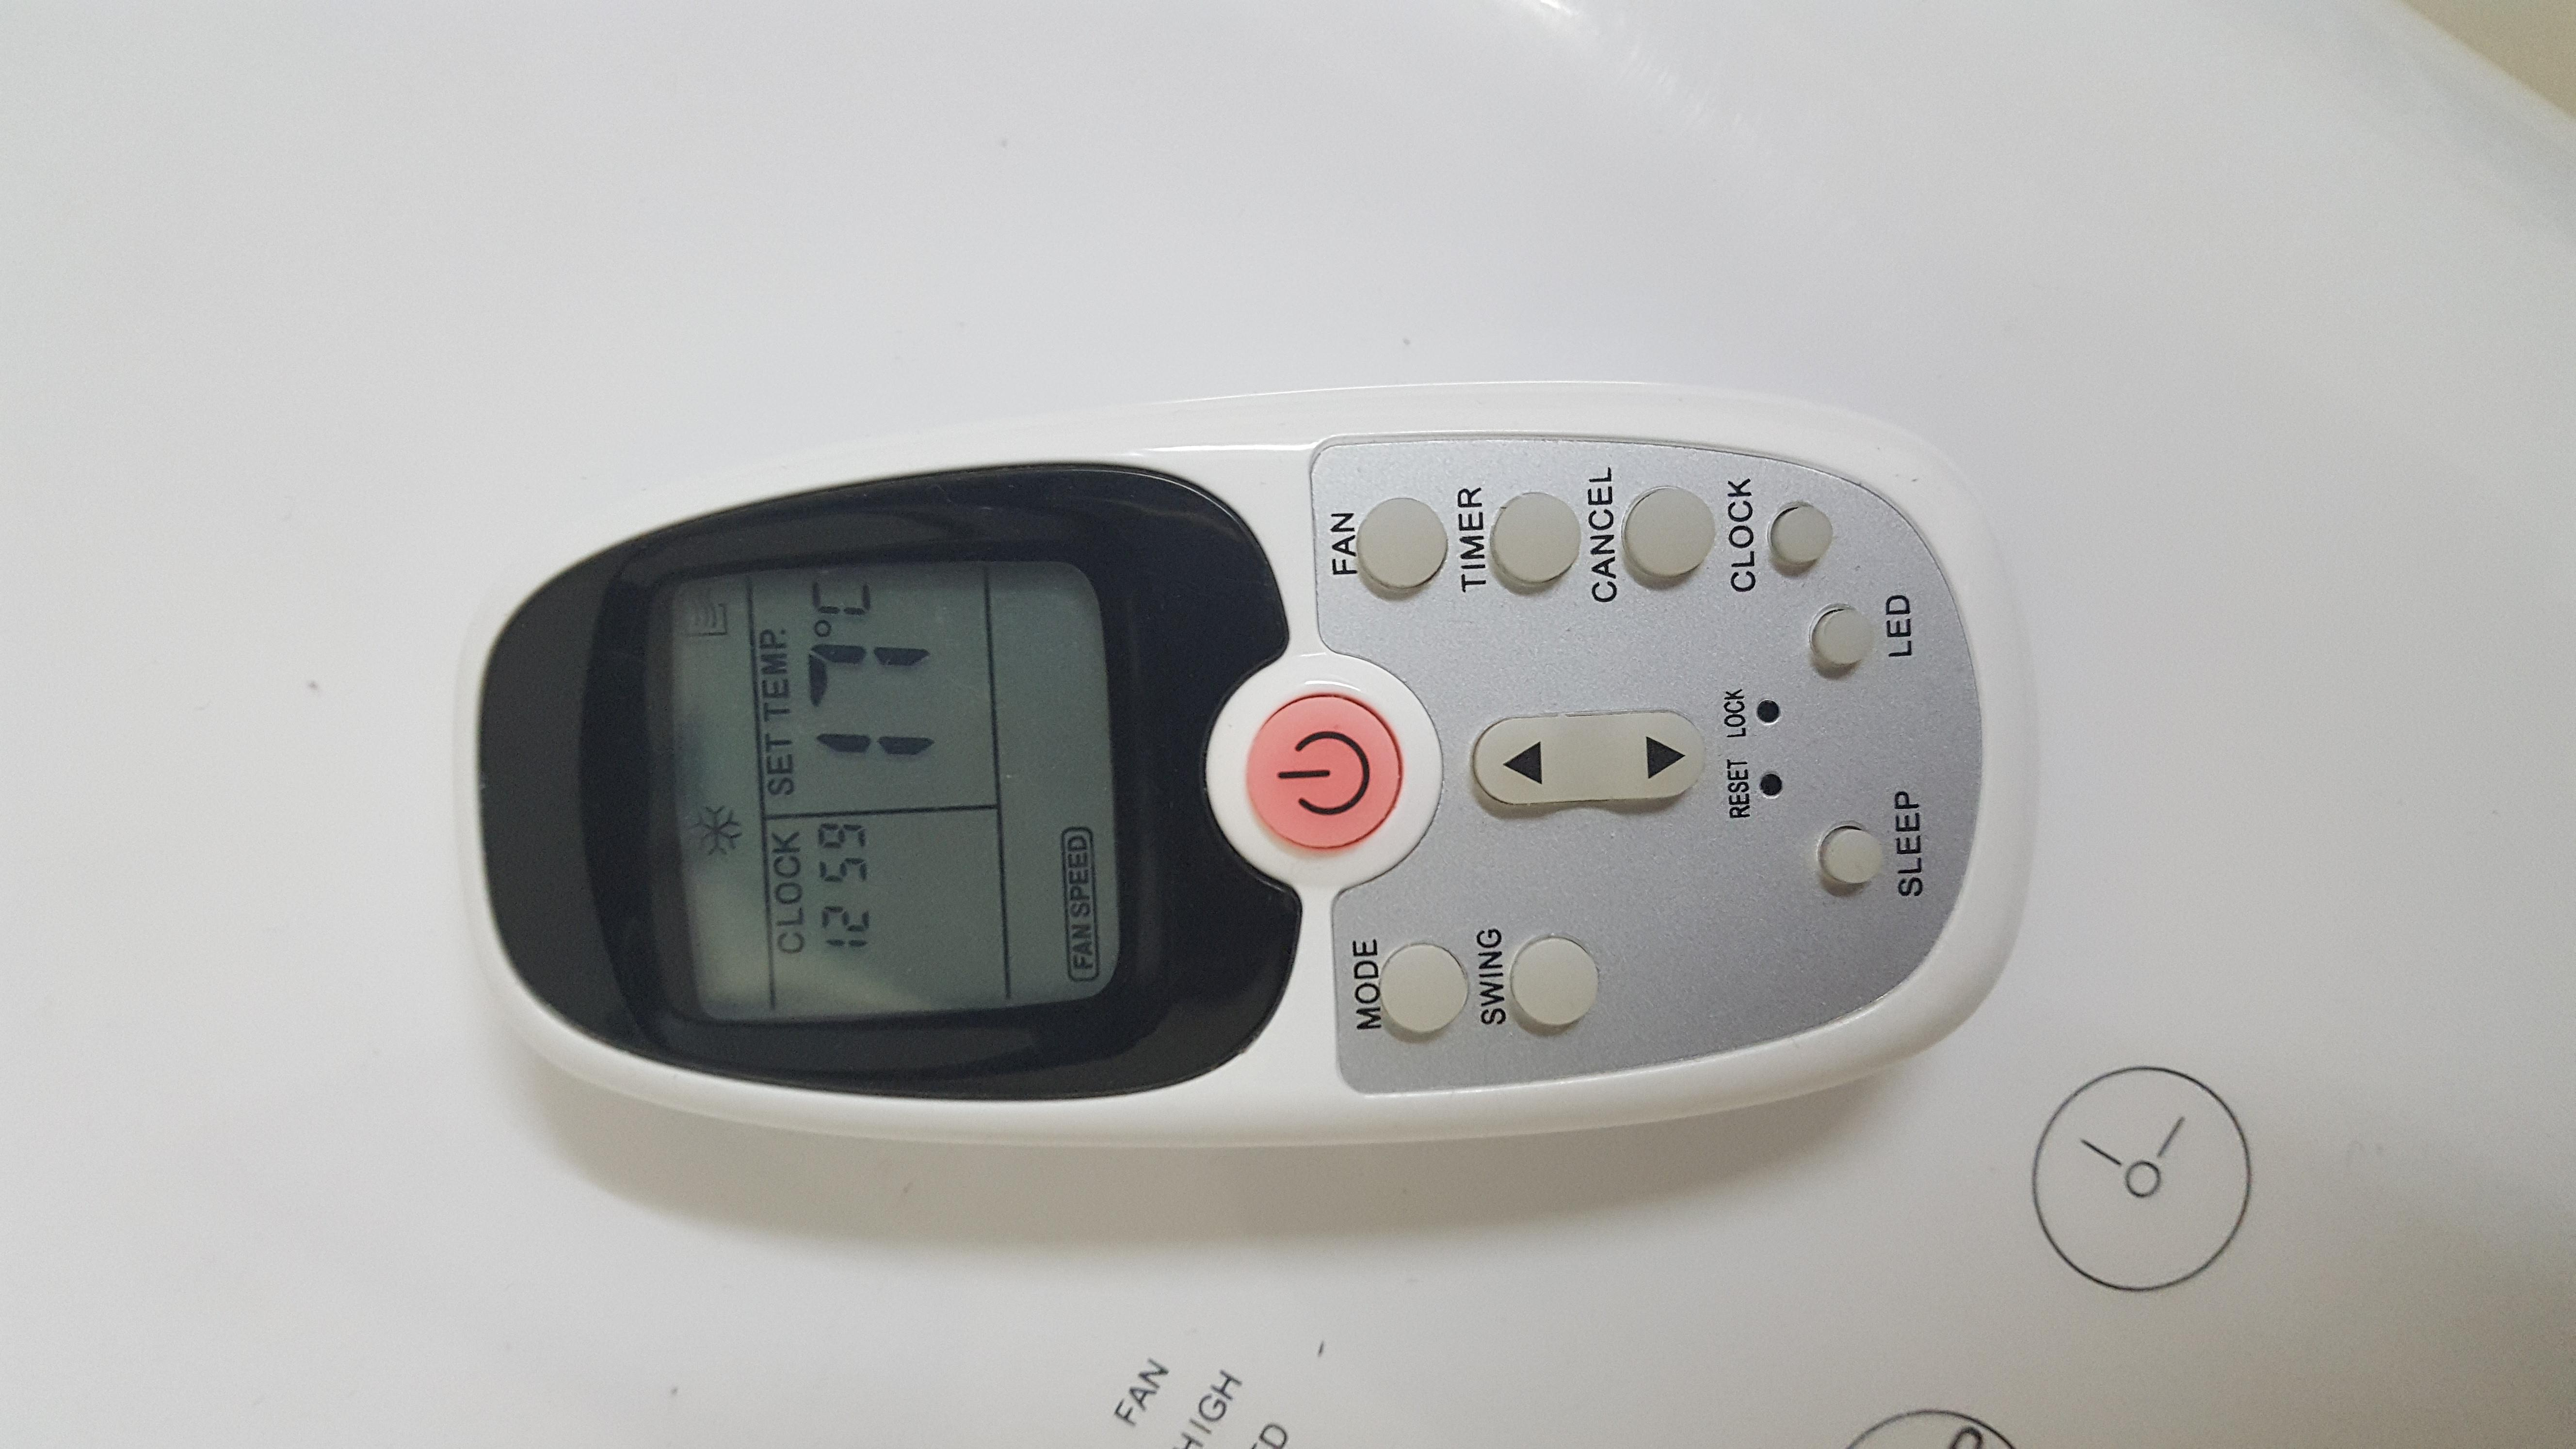 OSCAR 1 TON Portable AC | Qatar Living